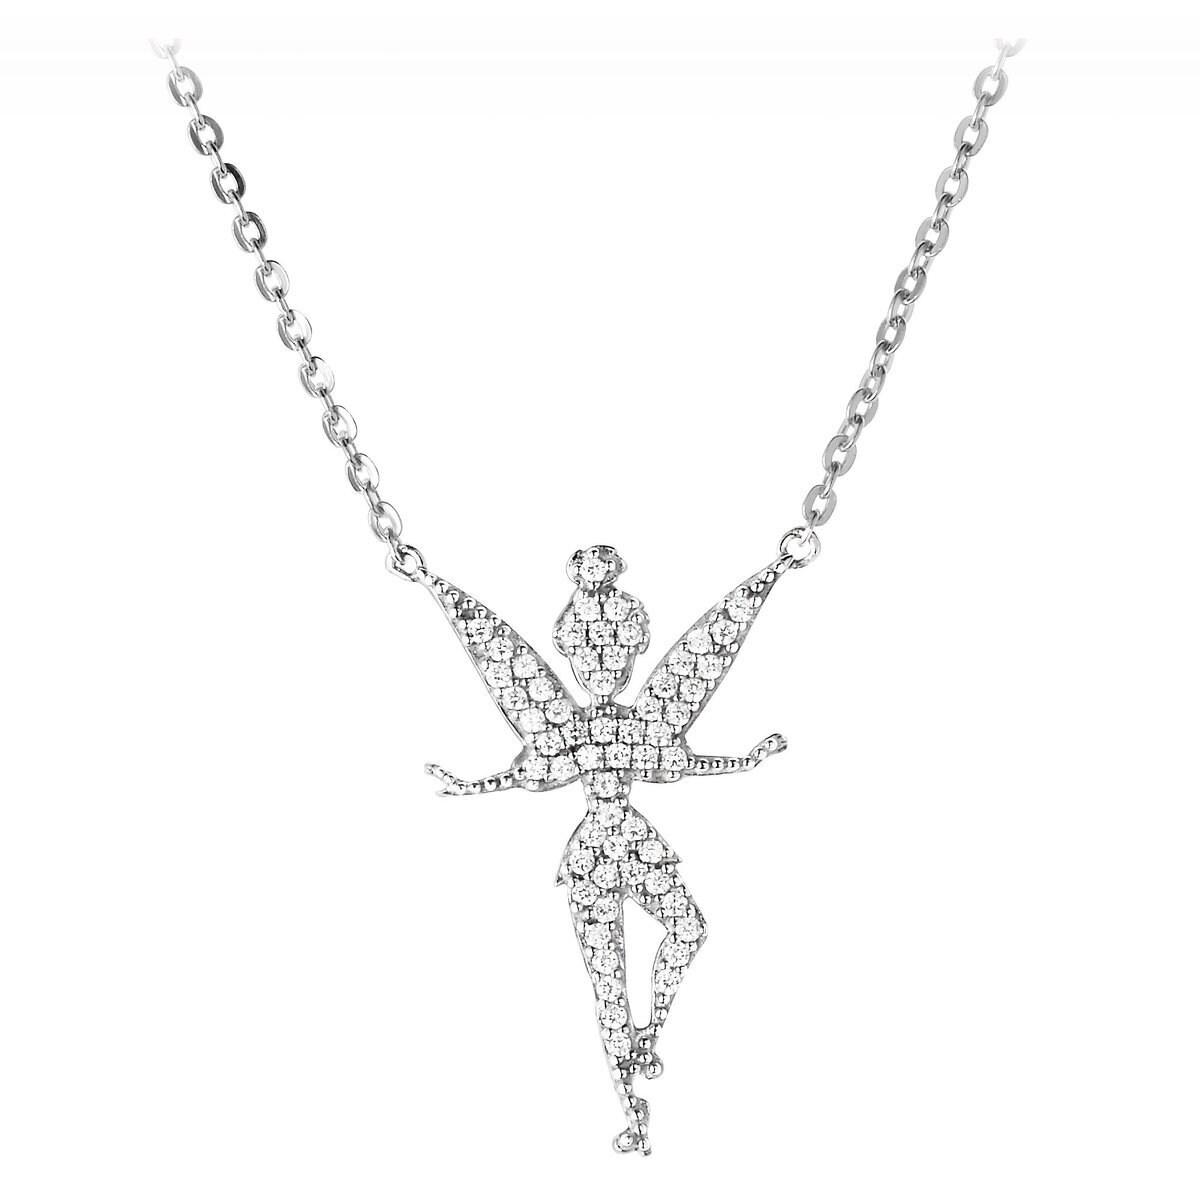 Tinker bell necklace by rebecca hook shopdisney product image of tinker bell necklace by rebecca hook 1 aloadofball Images